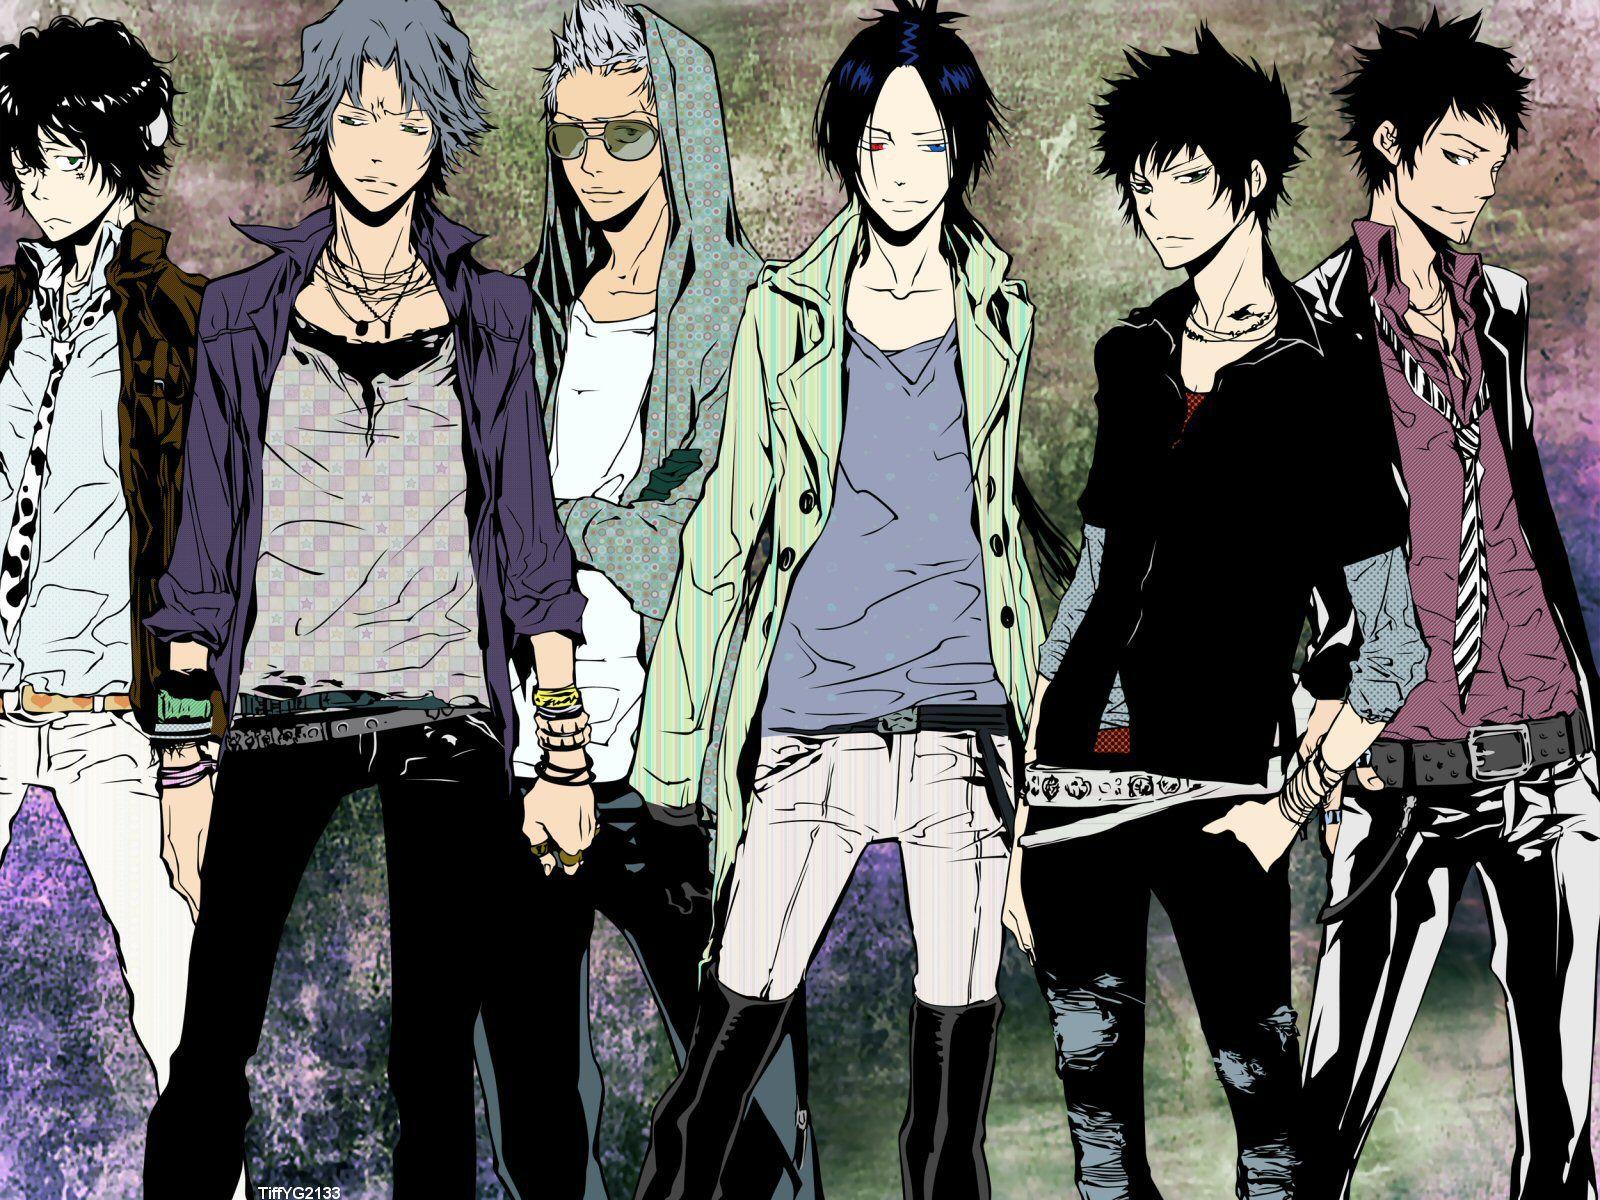 Awesome Anime Wallpaper AnimewallpapersCool Anime Boy